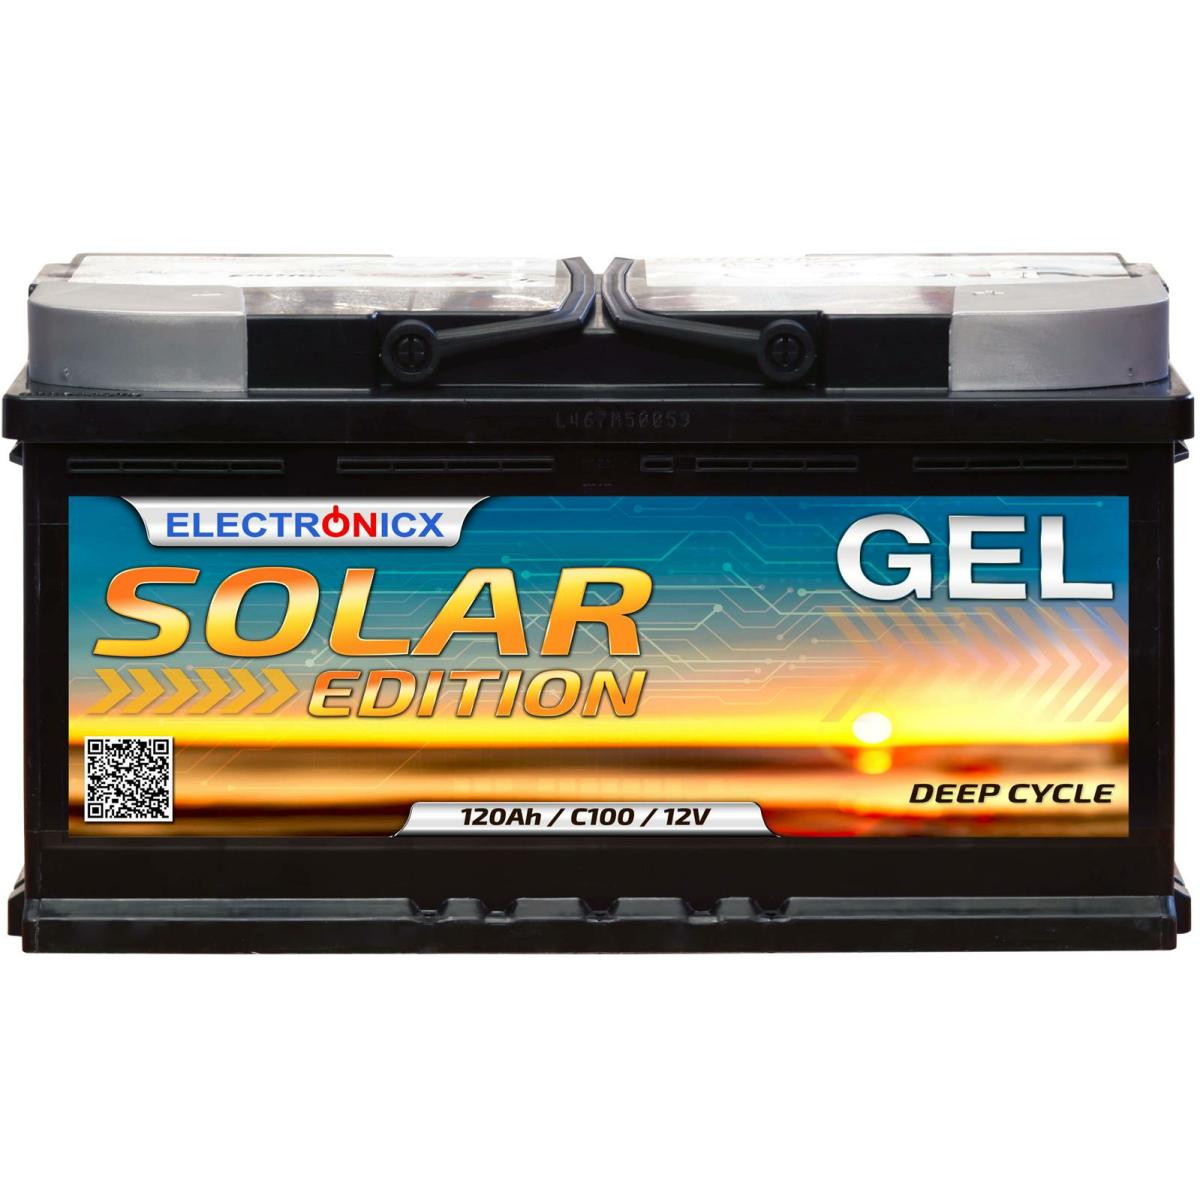 Electronicx Solar Edition Gel Batterie 120 AH 12V Solar Versorgung Solarbatterie